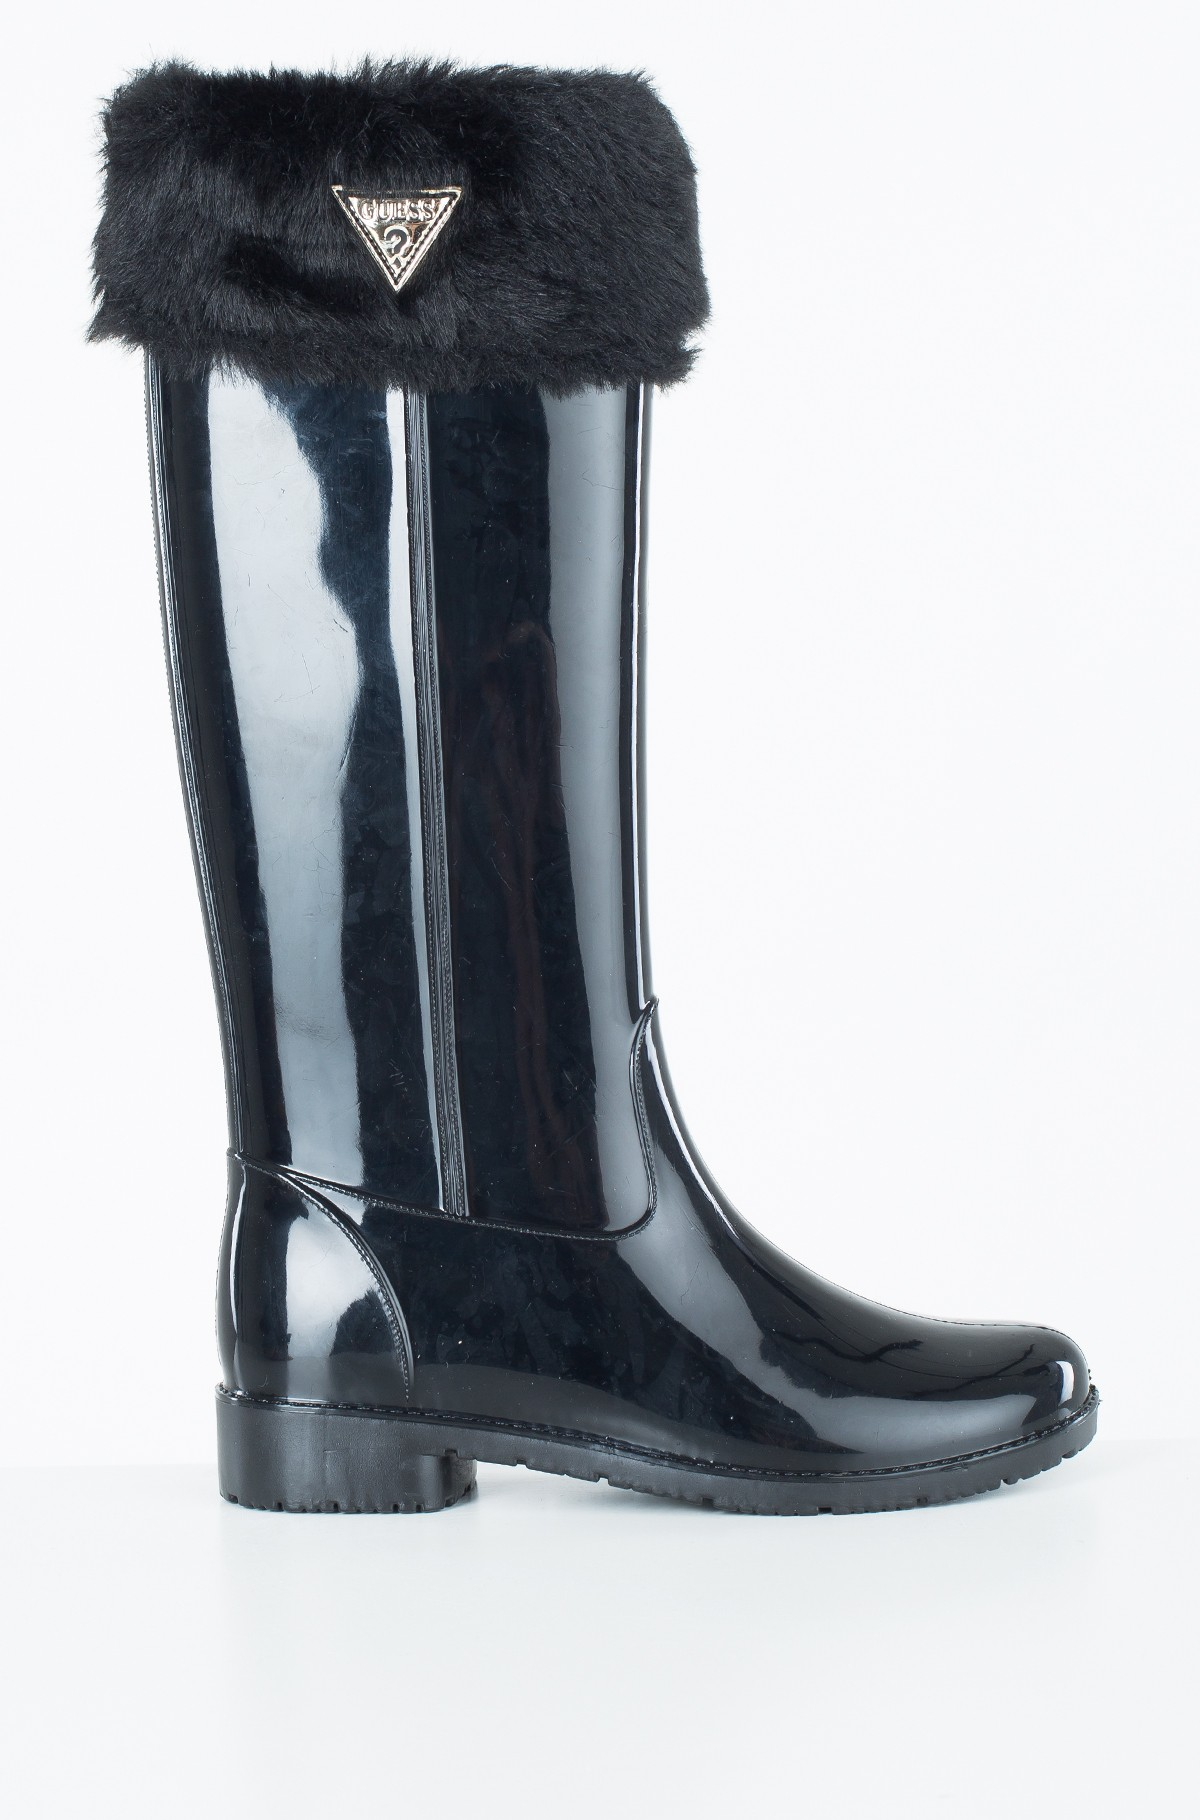 Guminiai batai FLRBE3 RUB11-full-1